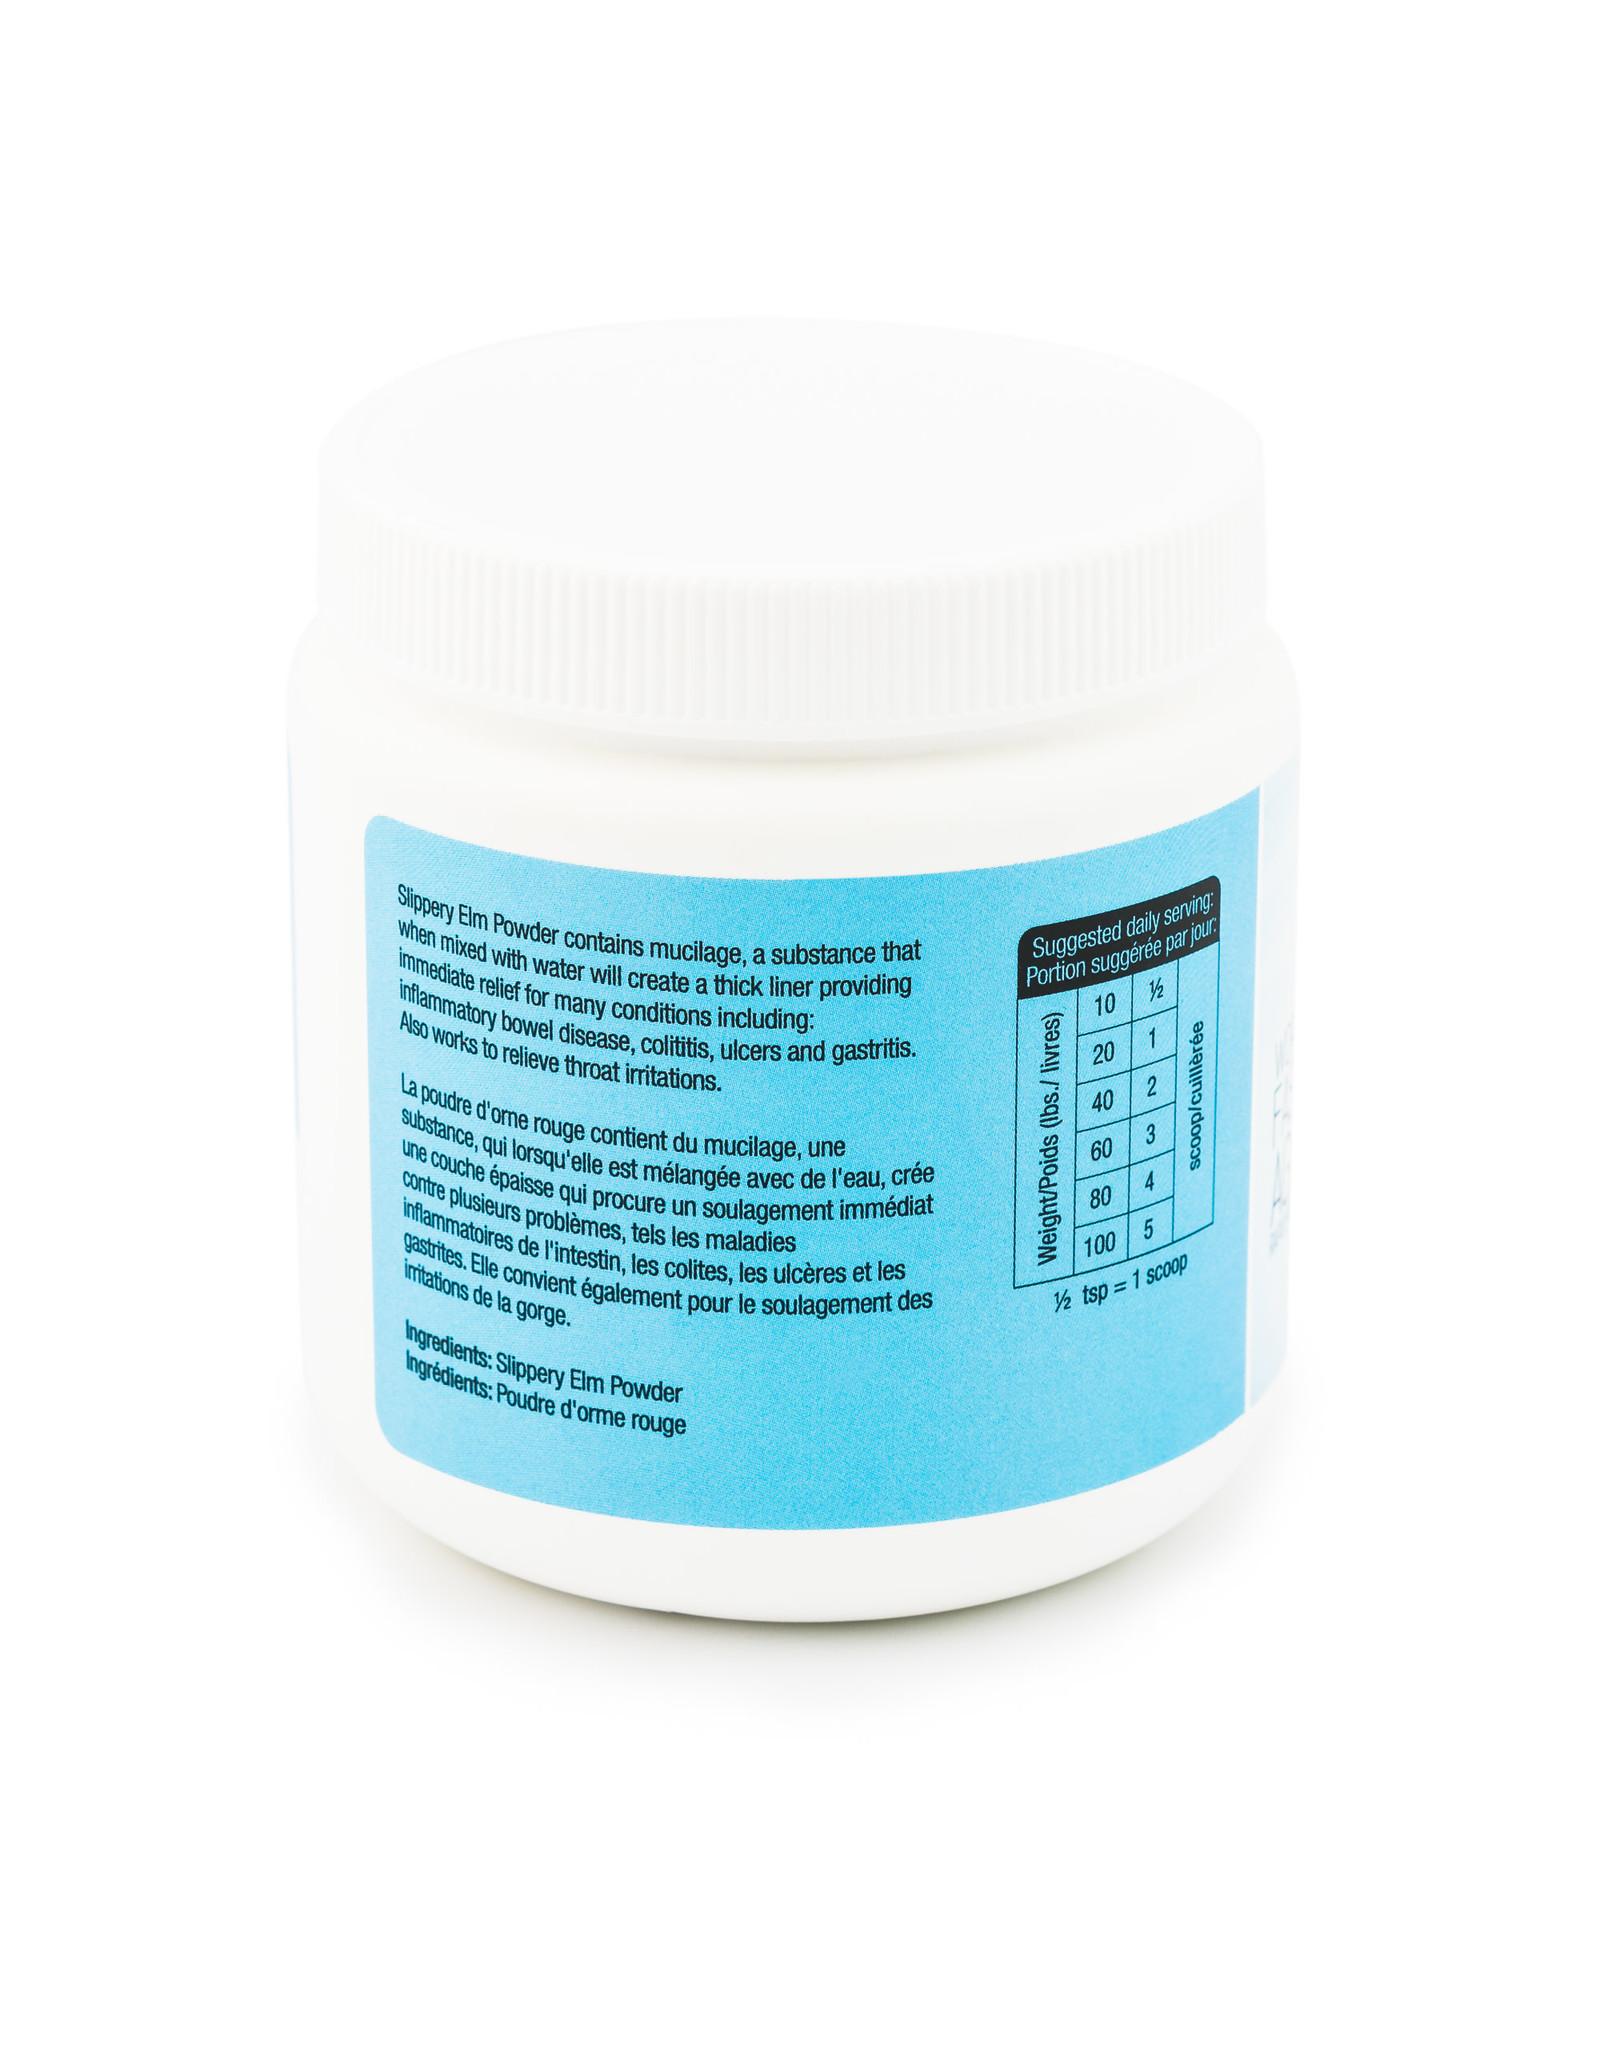 BCR BCR Thrive Slippery Elm Powder 80g